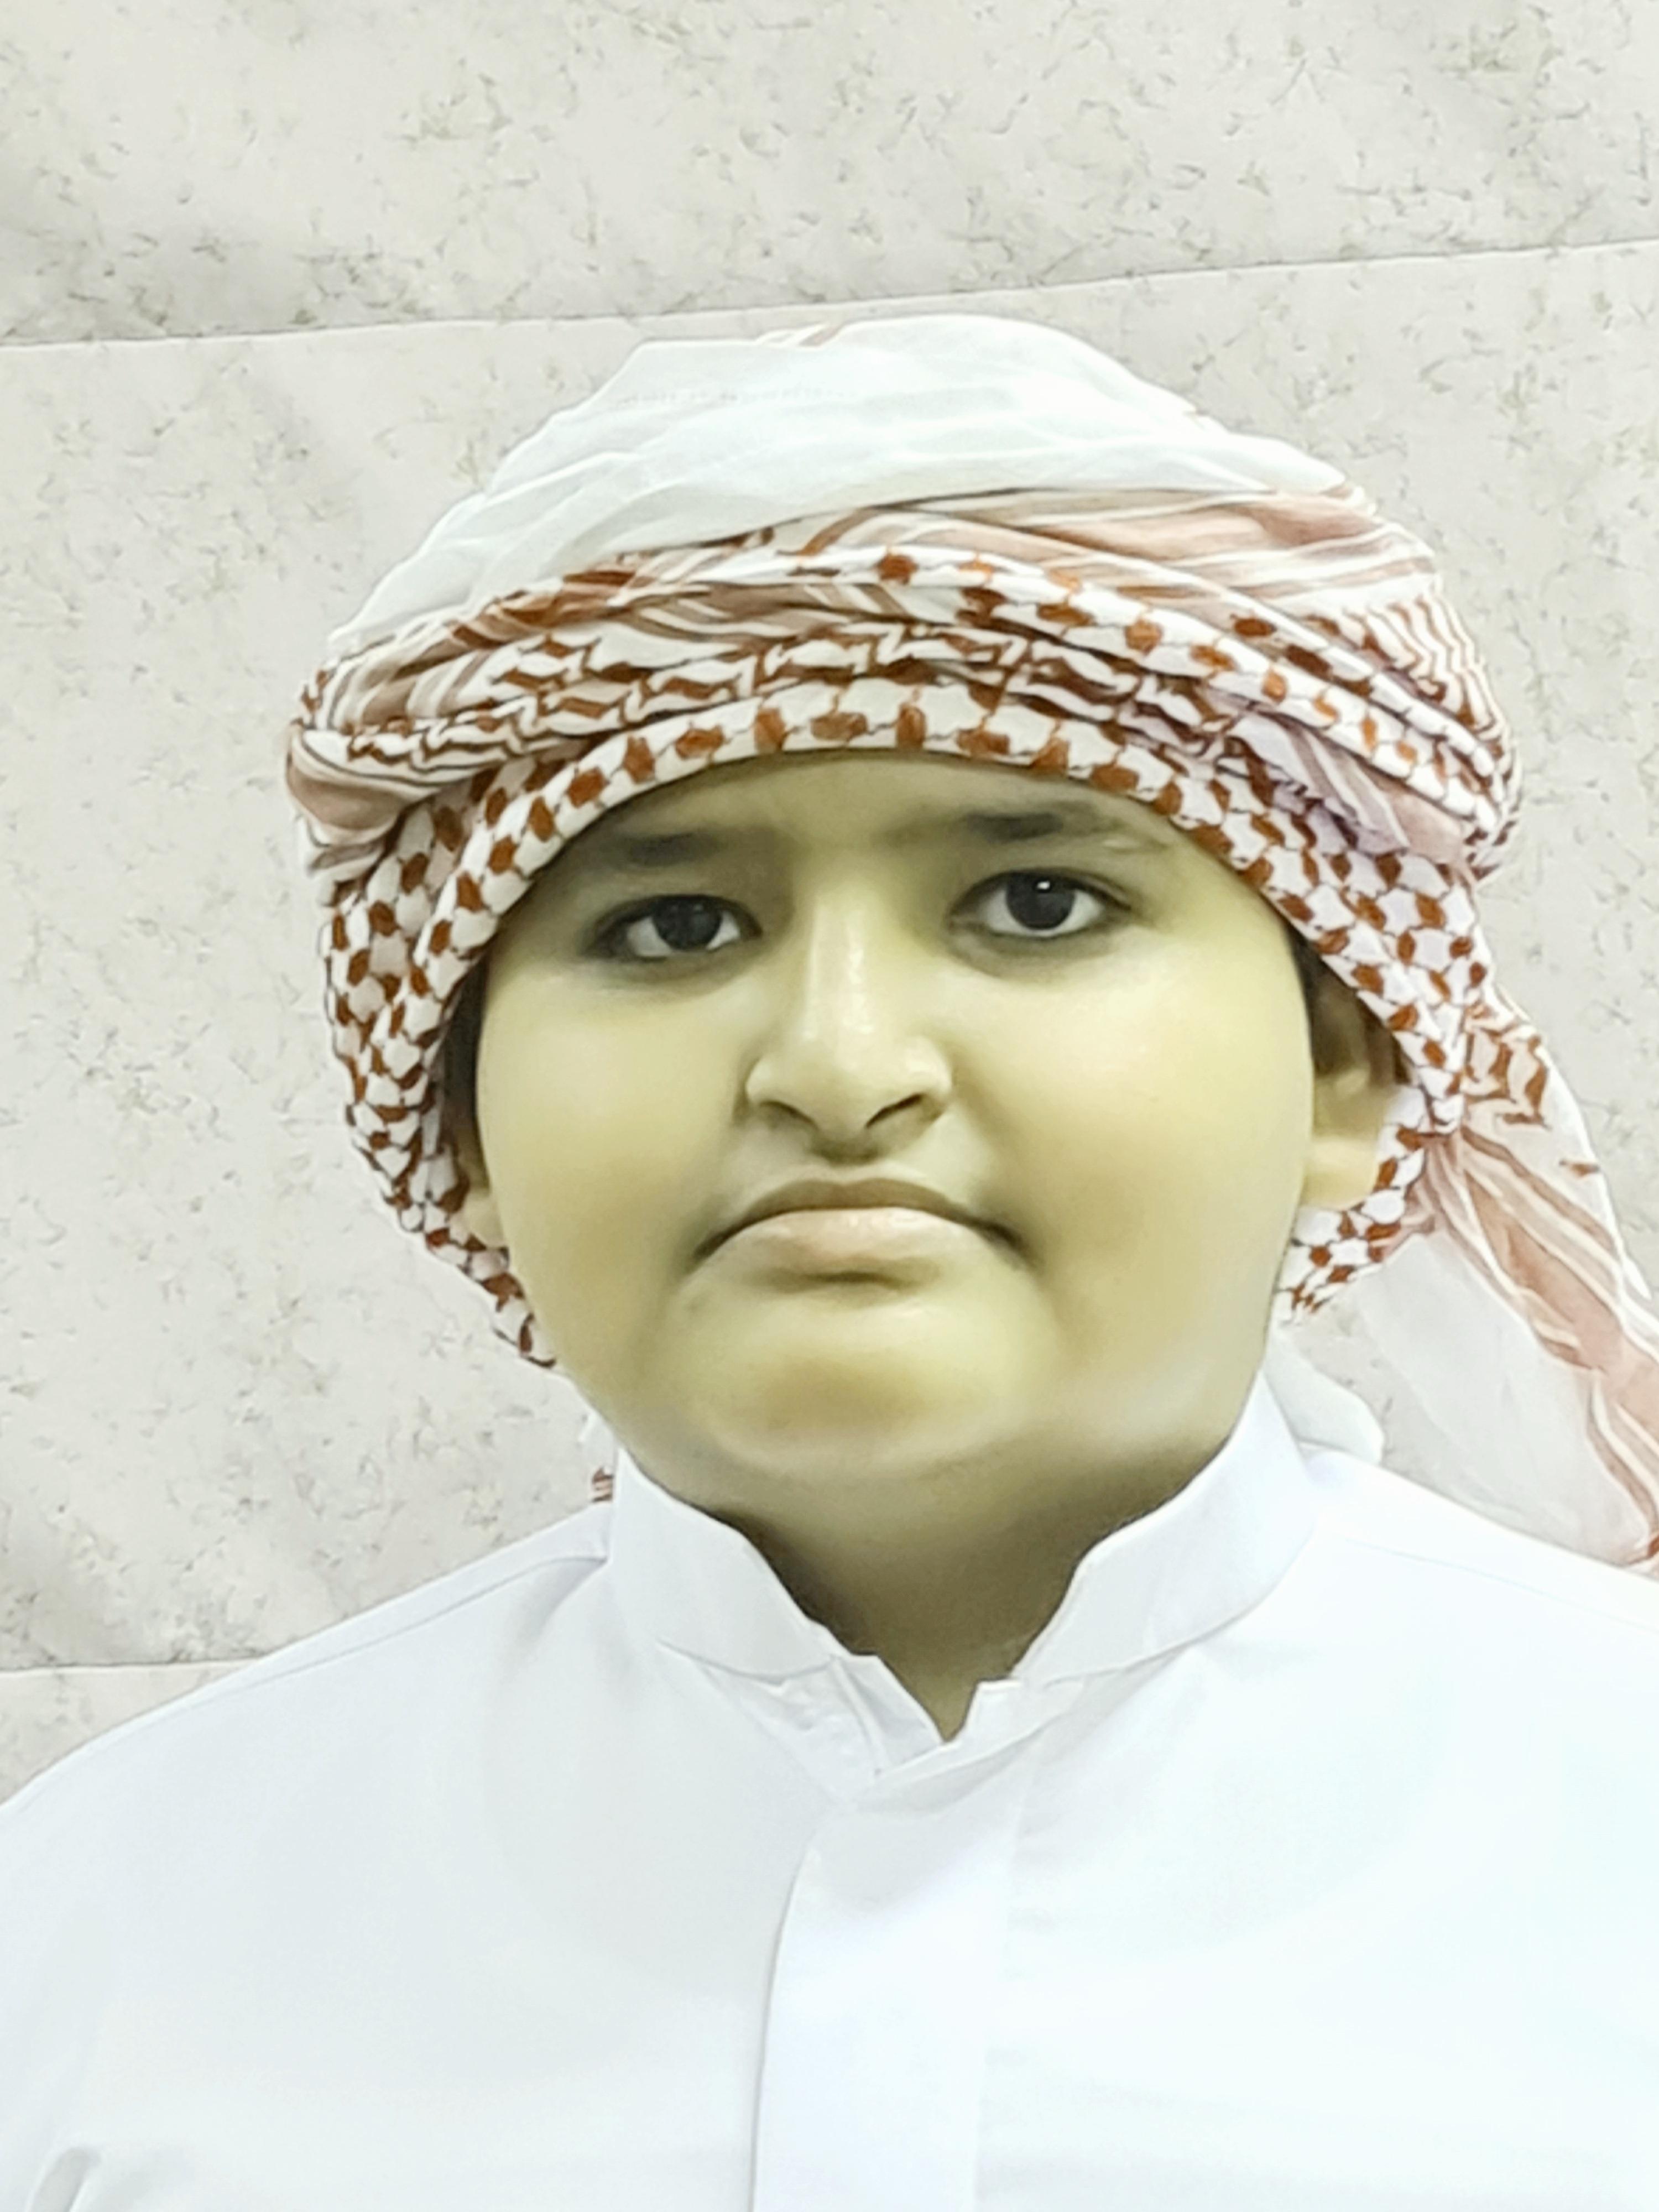 اماراتي للابد